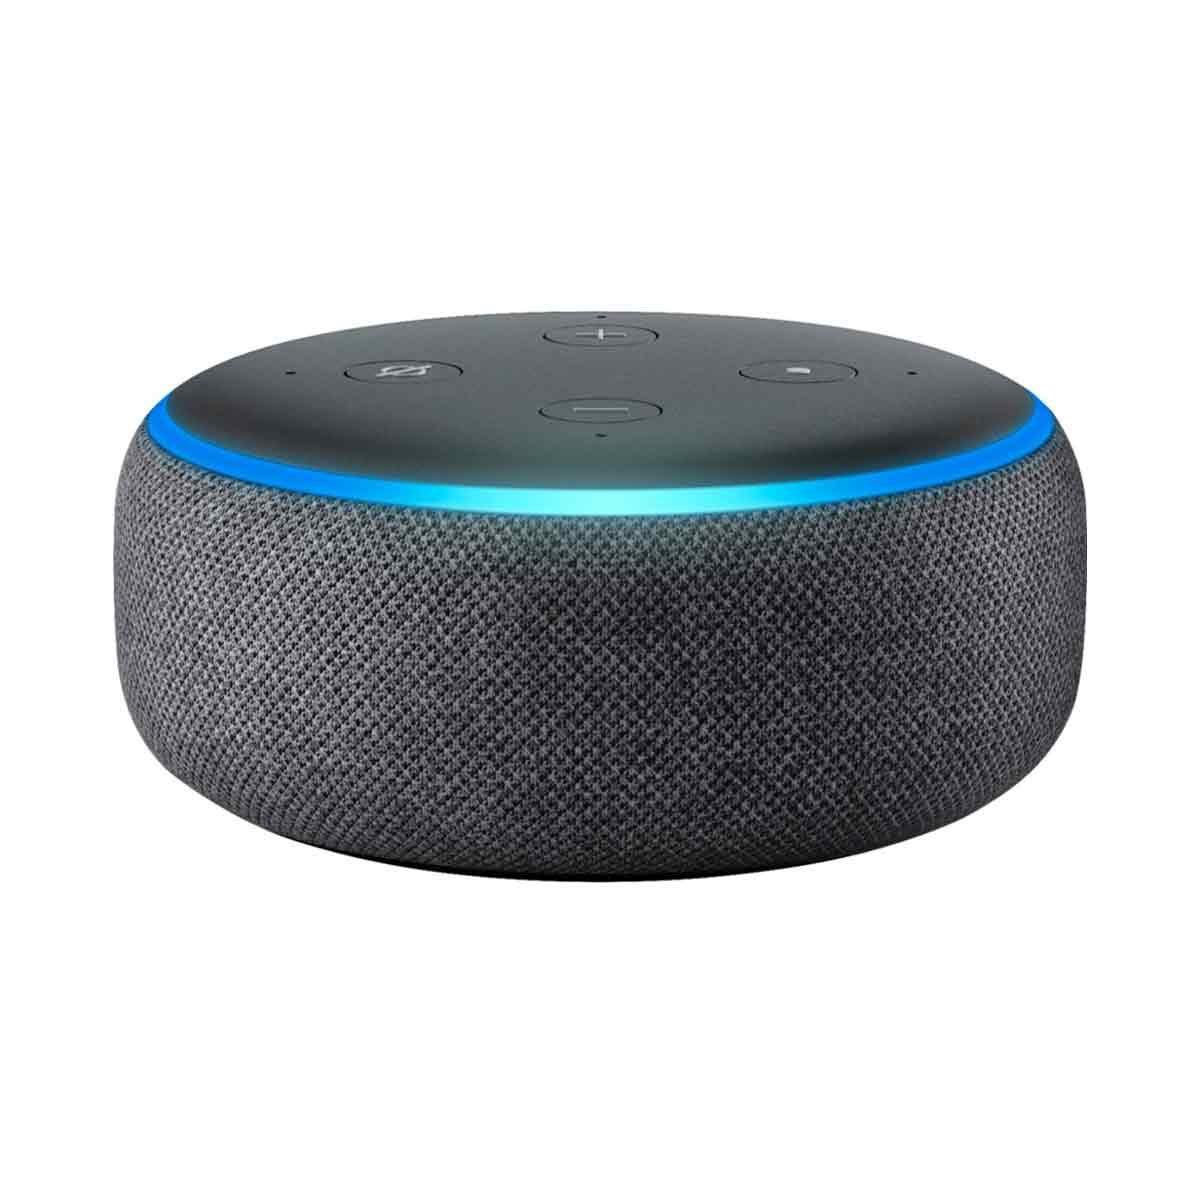 Amazon-Echo-Third-Generation